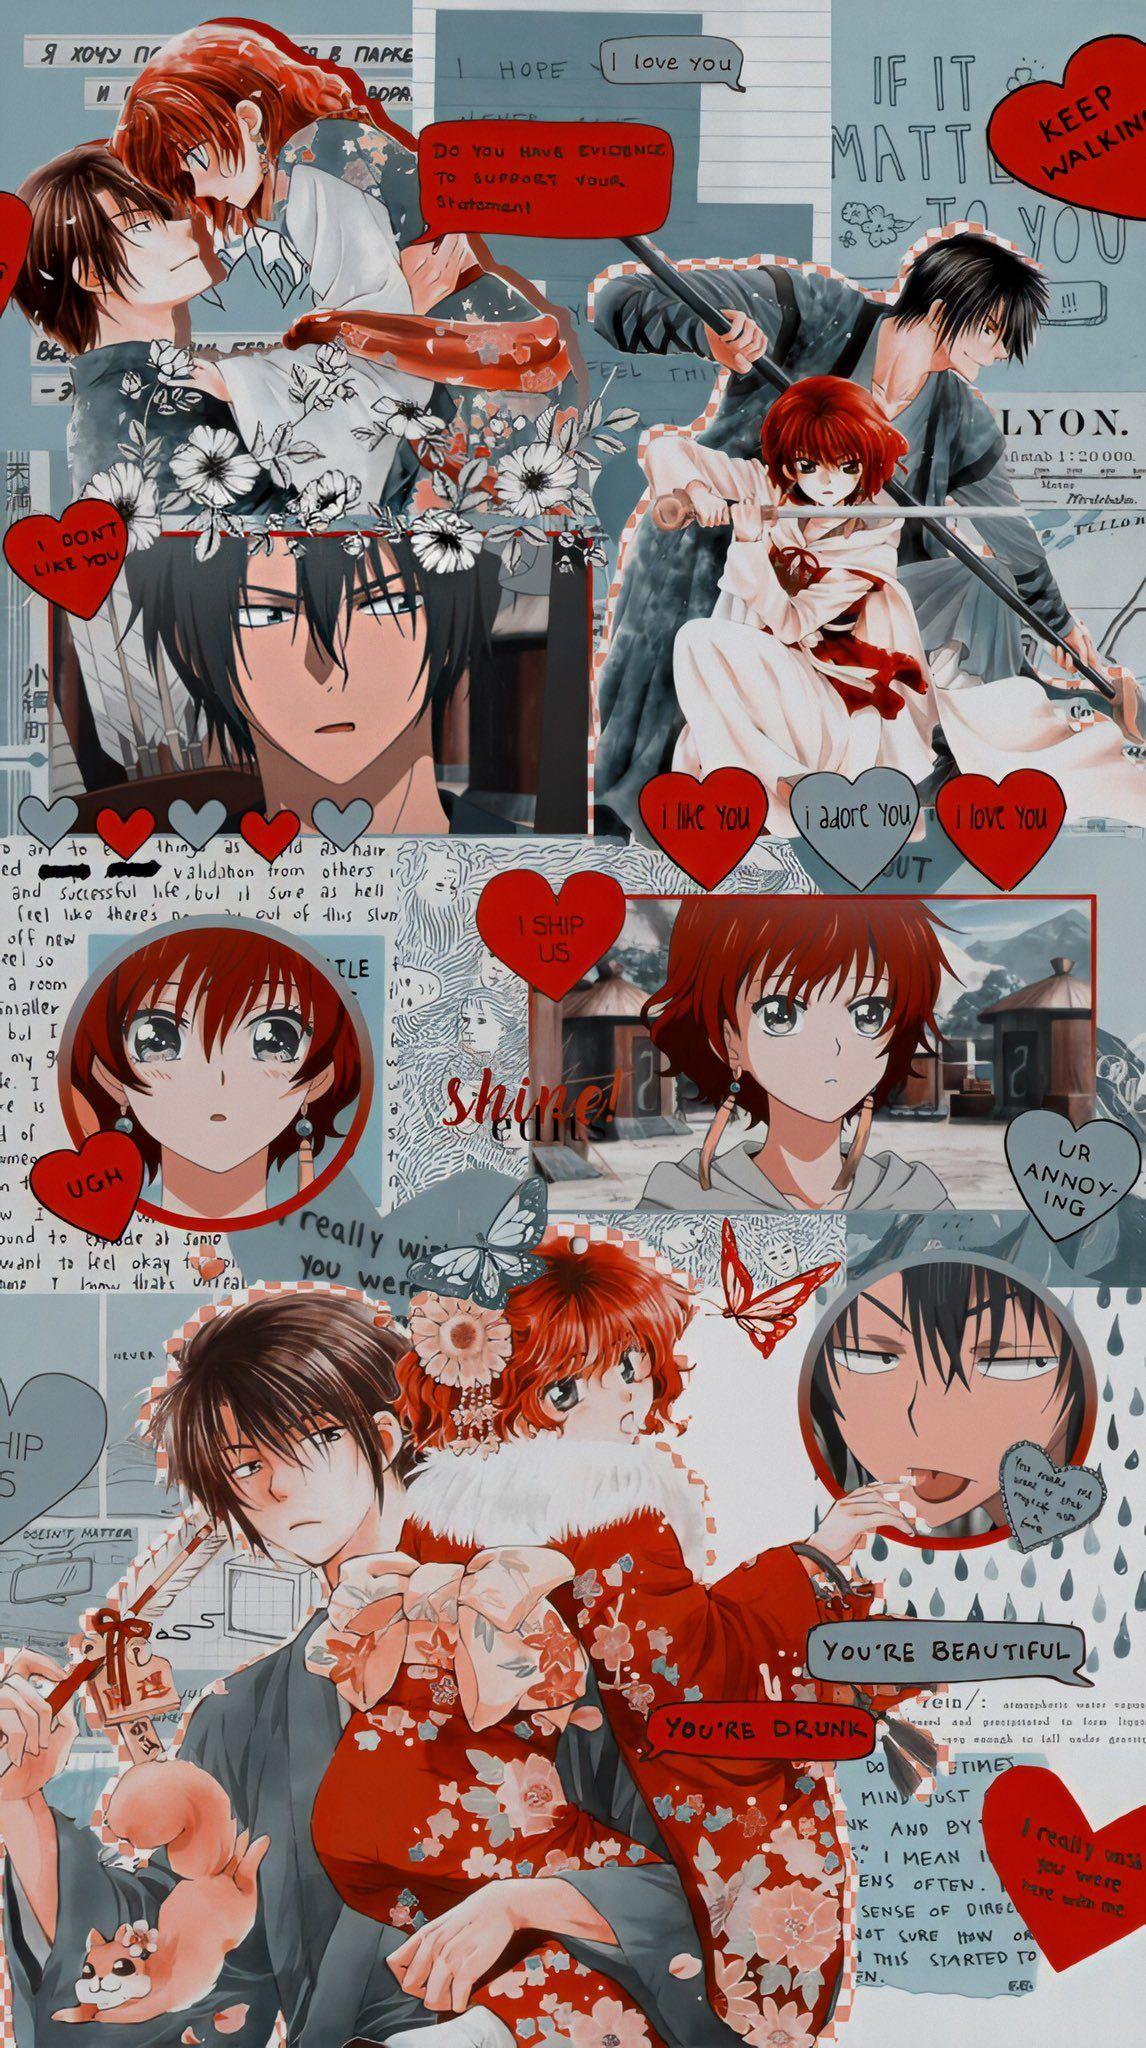 Akatsuki No Yona Wallpaper Yona Hak In 2020 Anime Wallpaper Cute Anime Wallpaper Anime Wallpaper Iphone